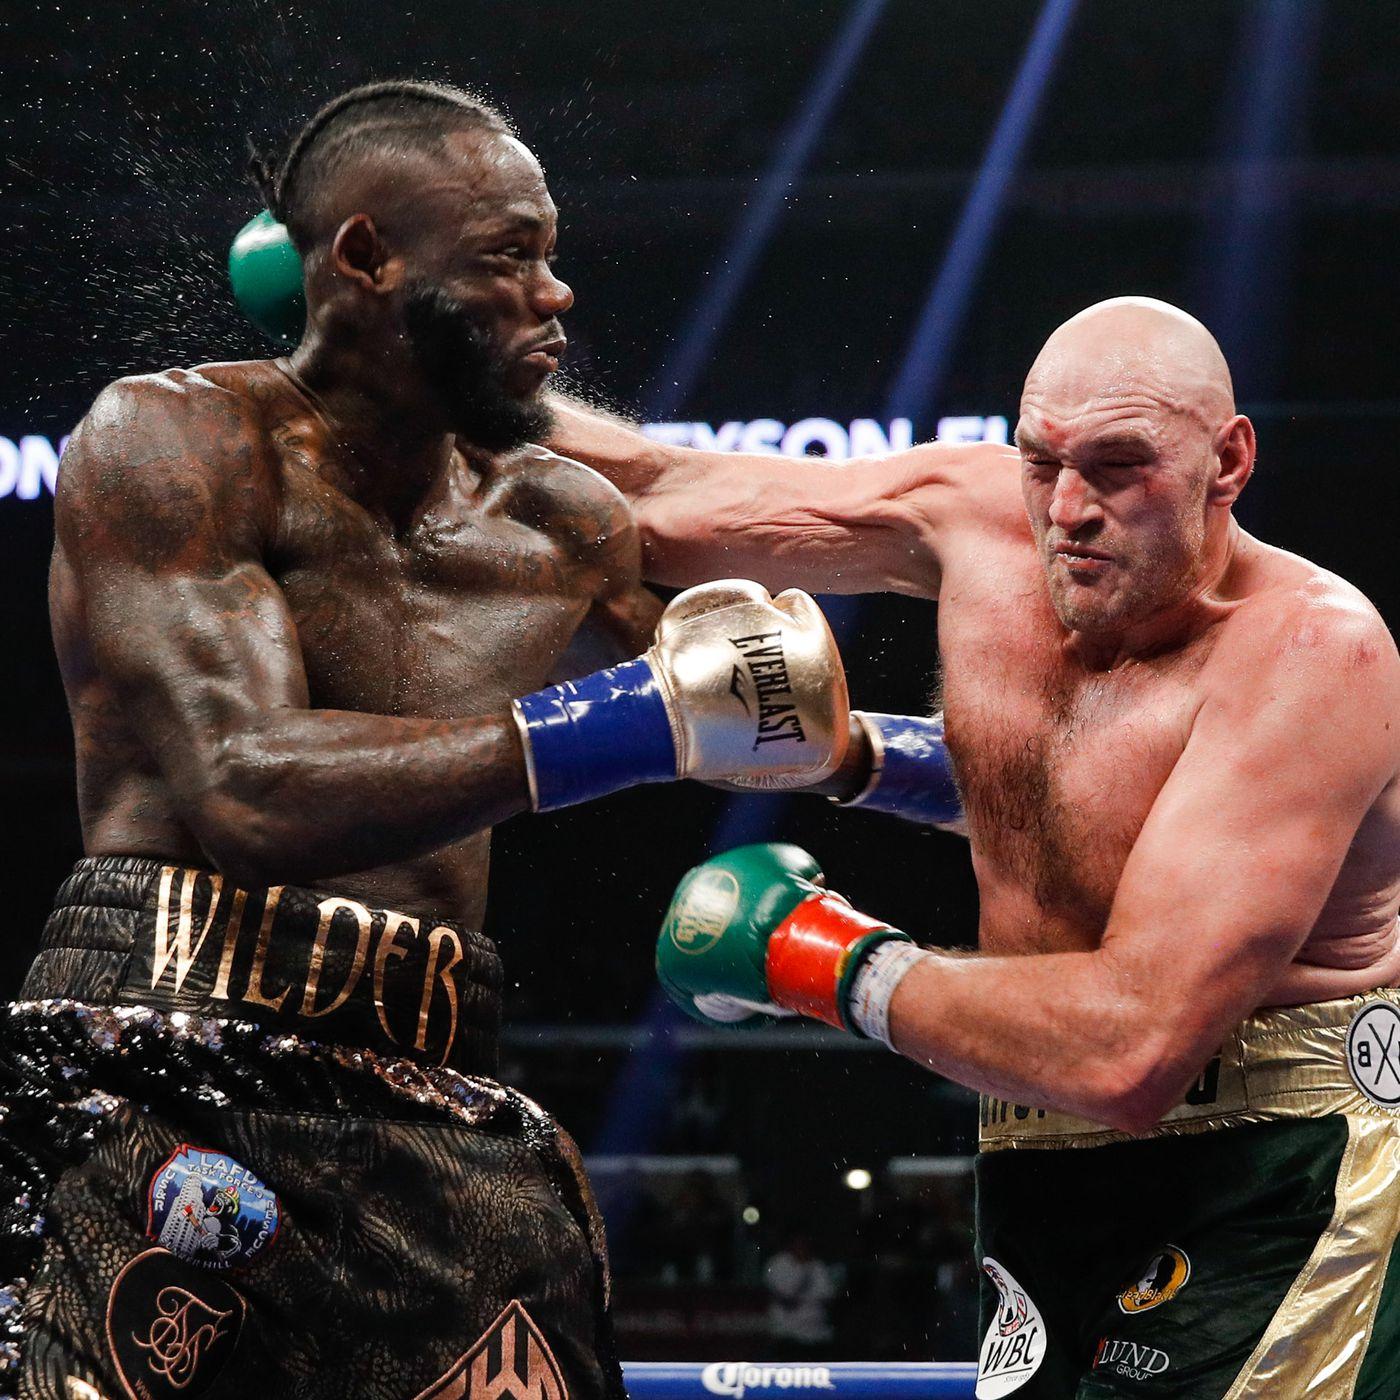 Deontay Wilder vs. Tyson Fury 2: Live round-by-round updates - MMA ...